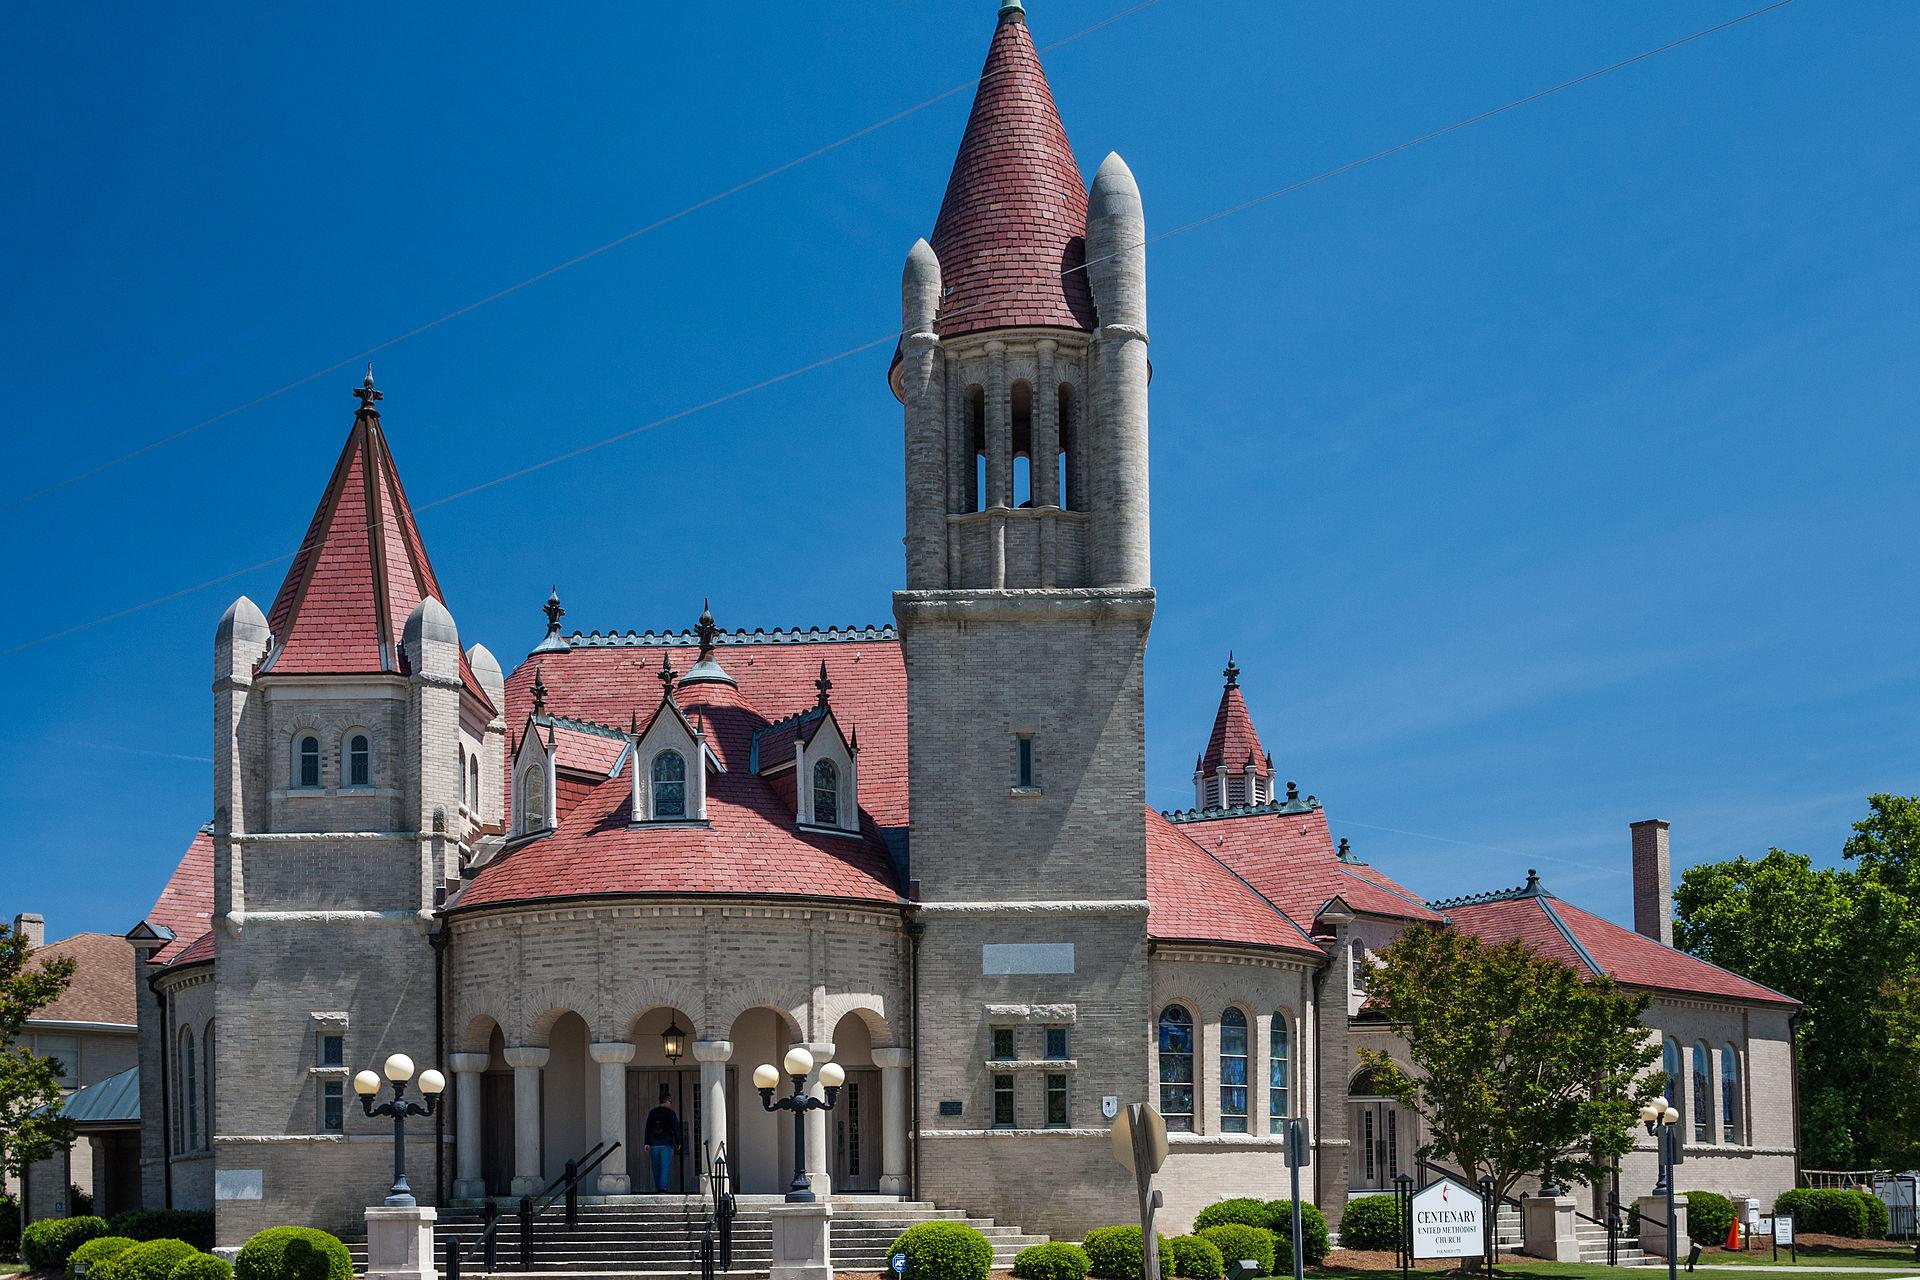 Centenary Methodist Church New Bern North Carolina